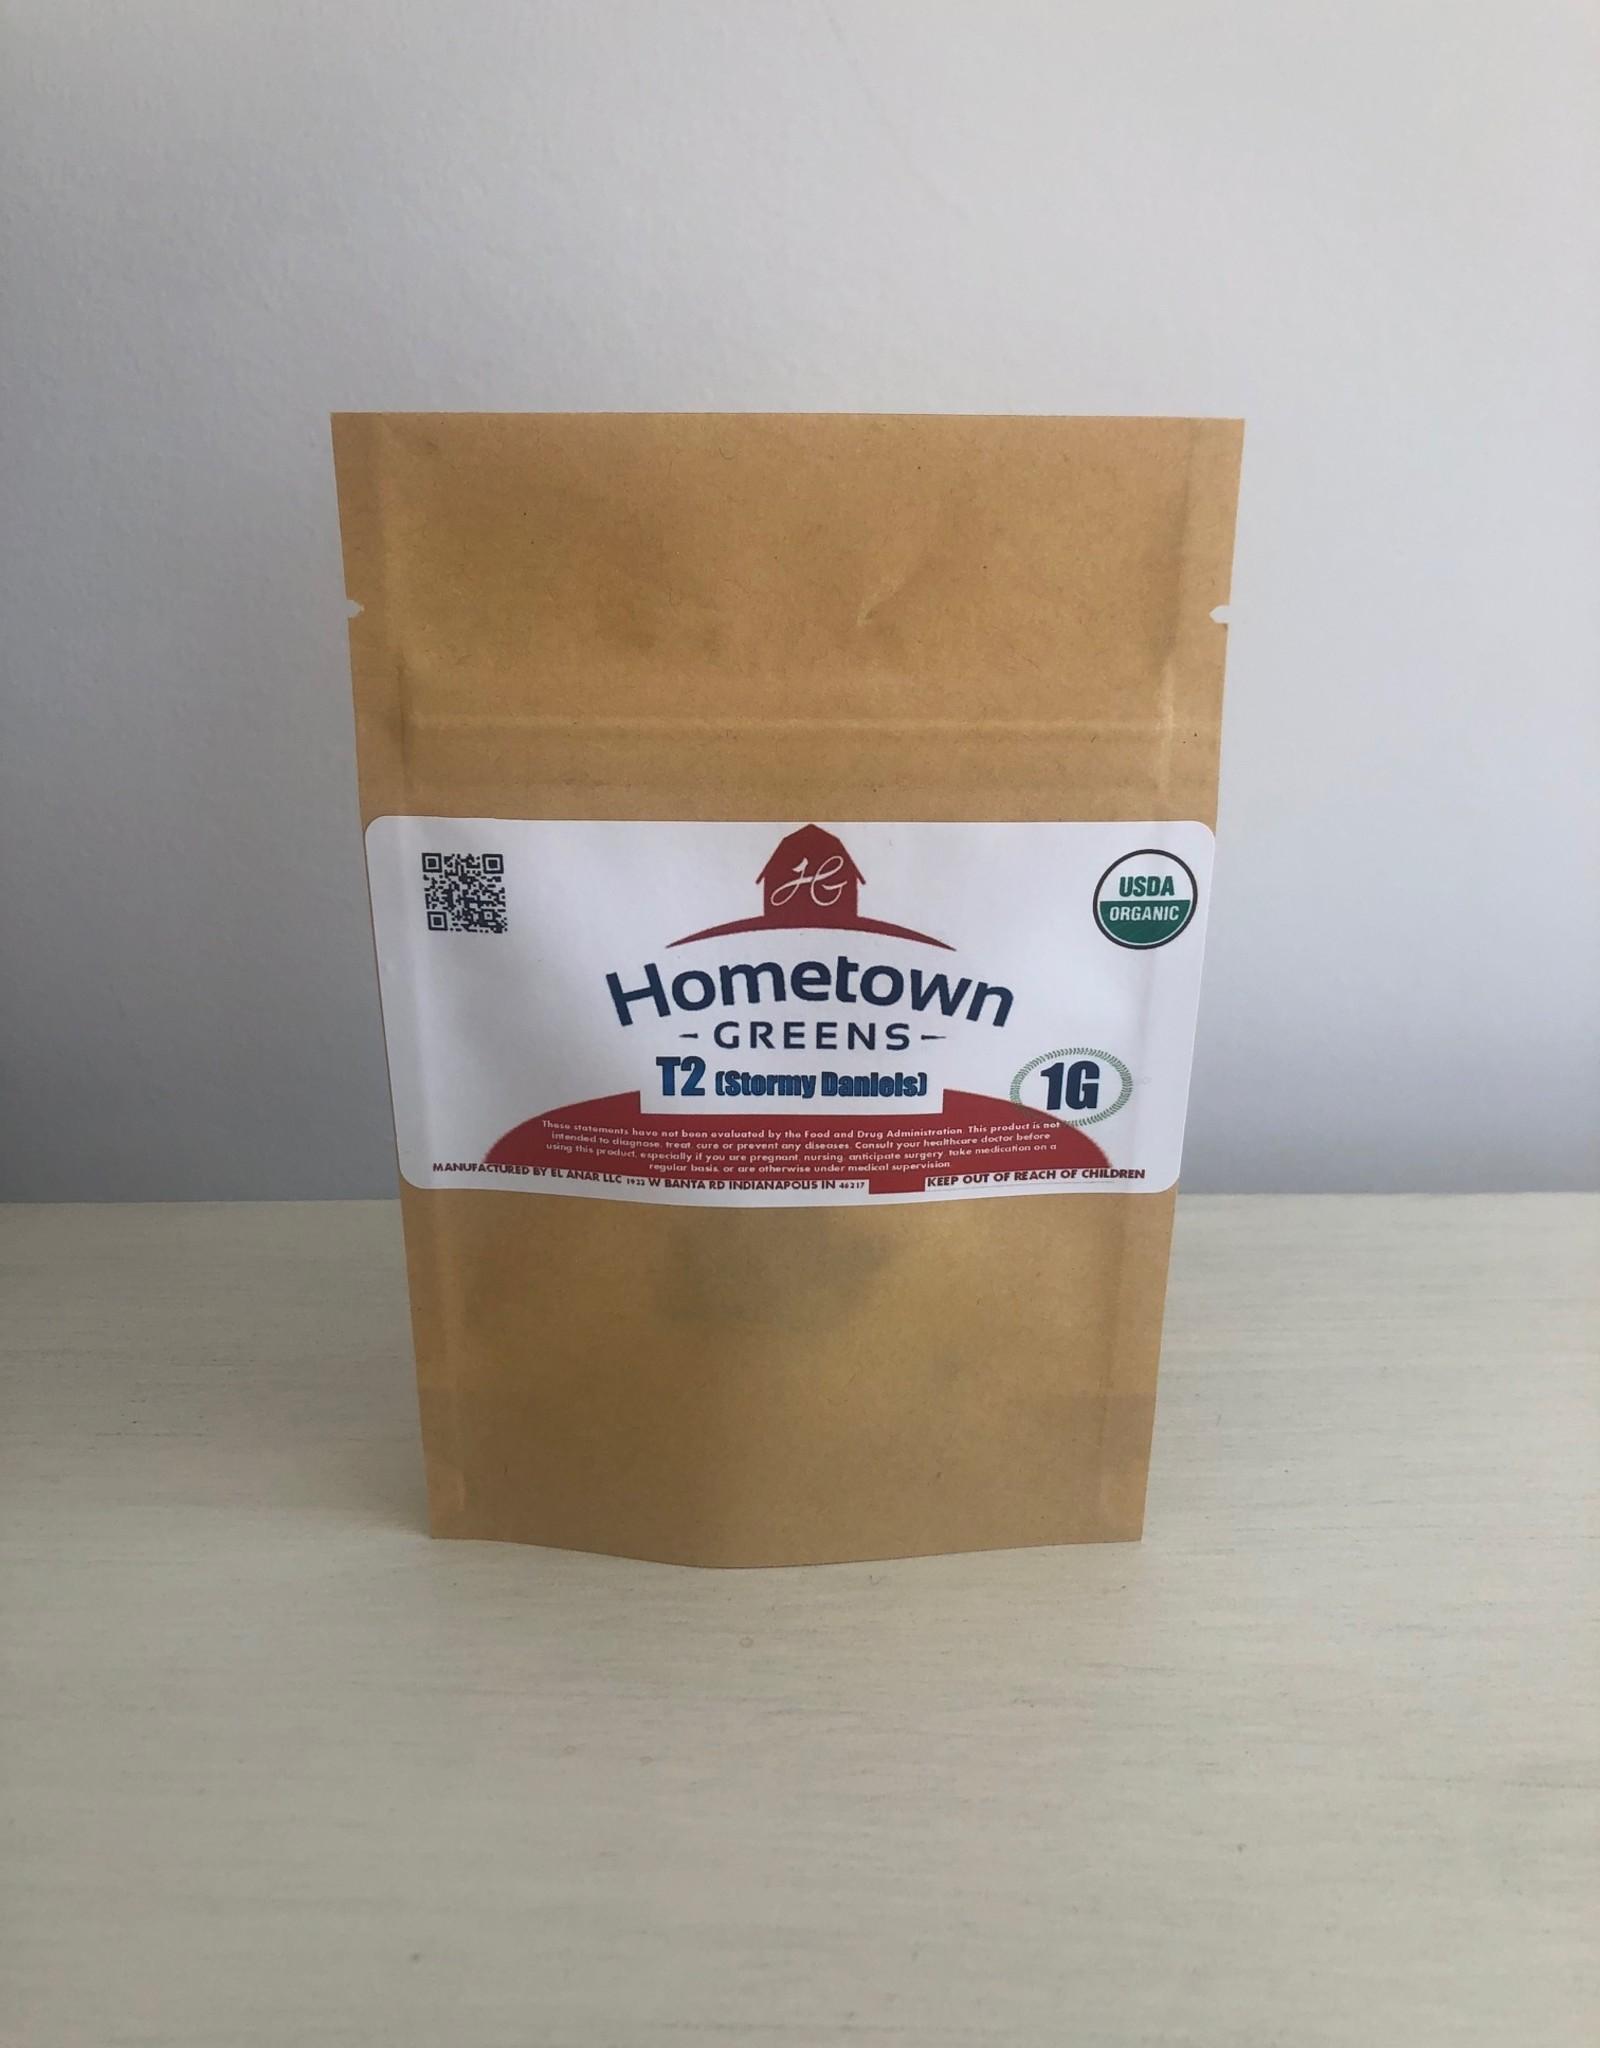 Hometown Greens T2 (Stormy Daniels) Hemp Flower - 1g